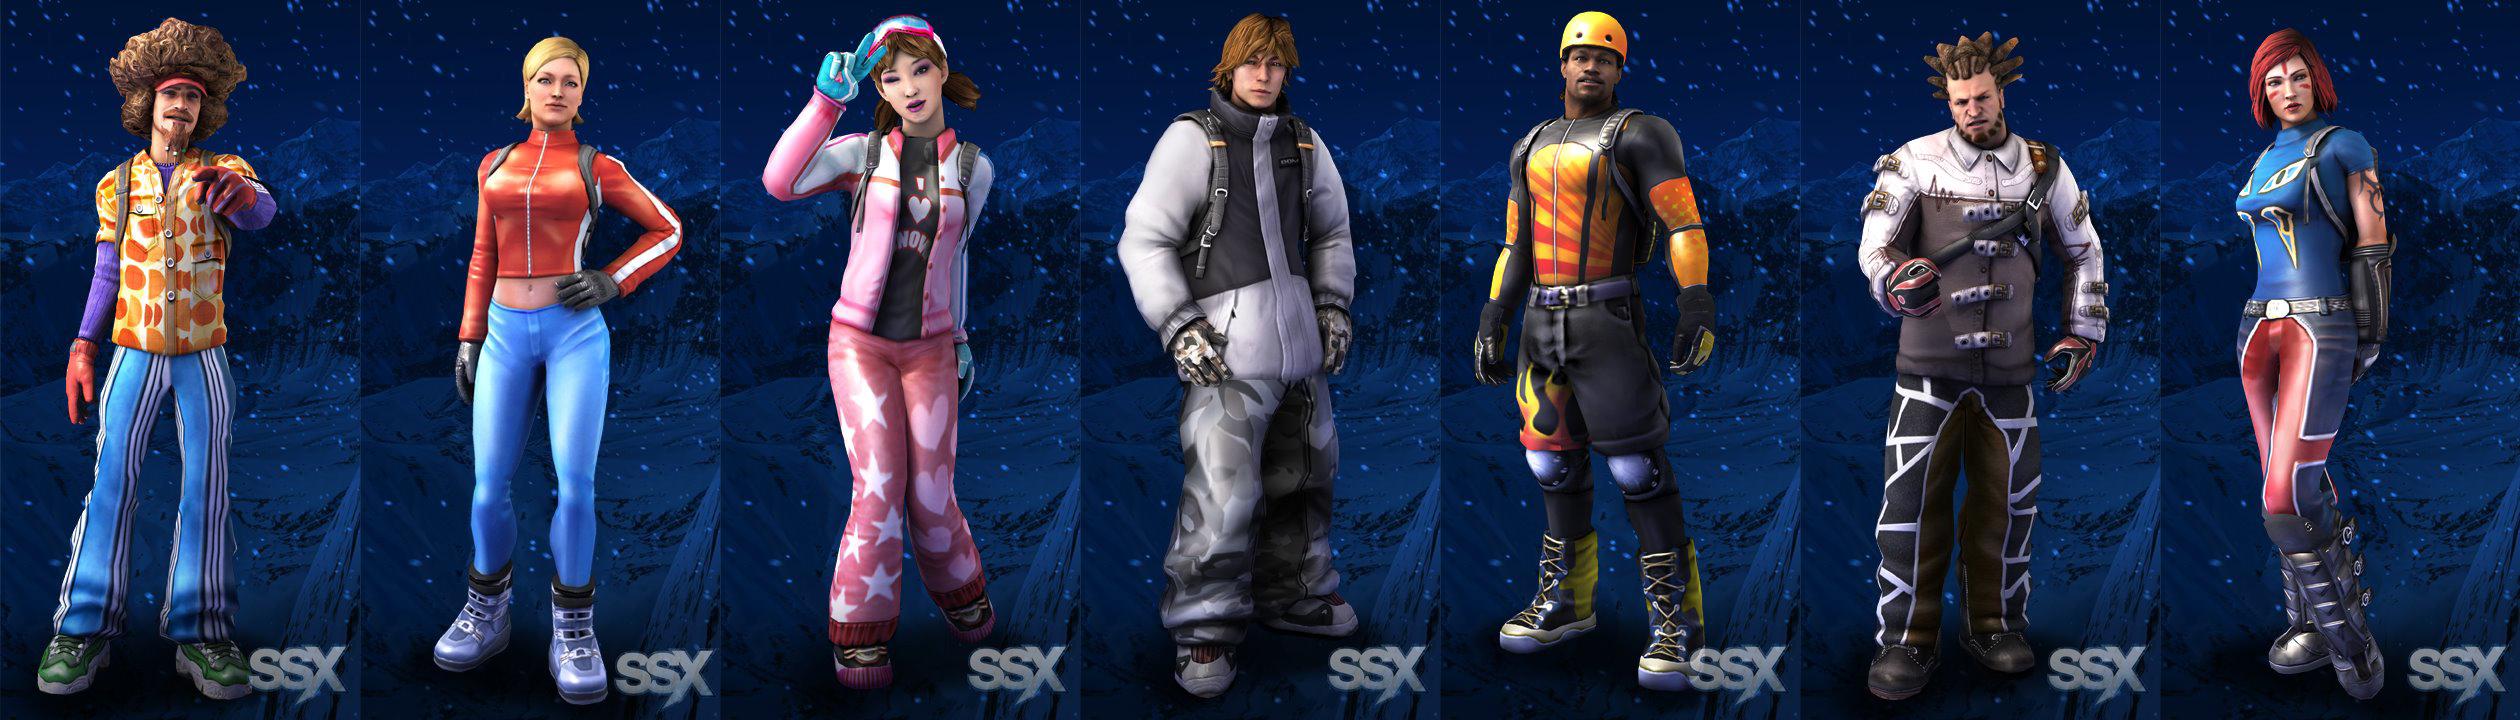 fantastic fun machine: SSX Characters